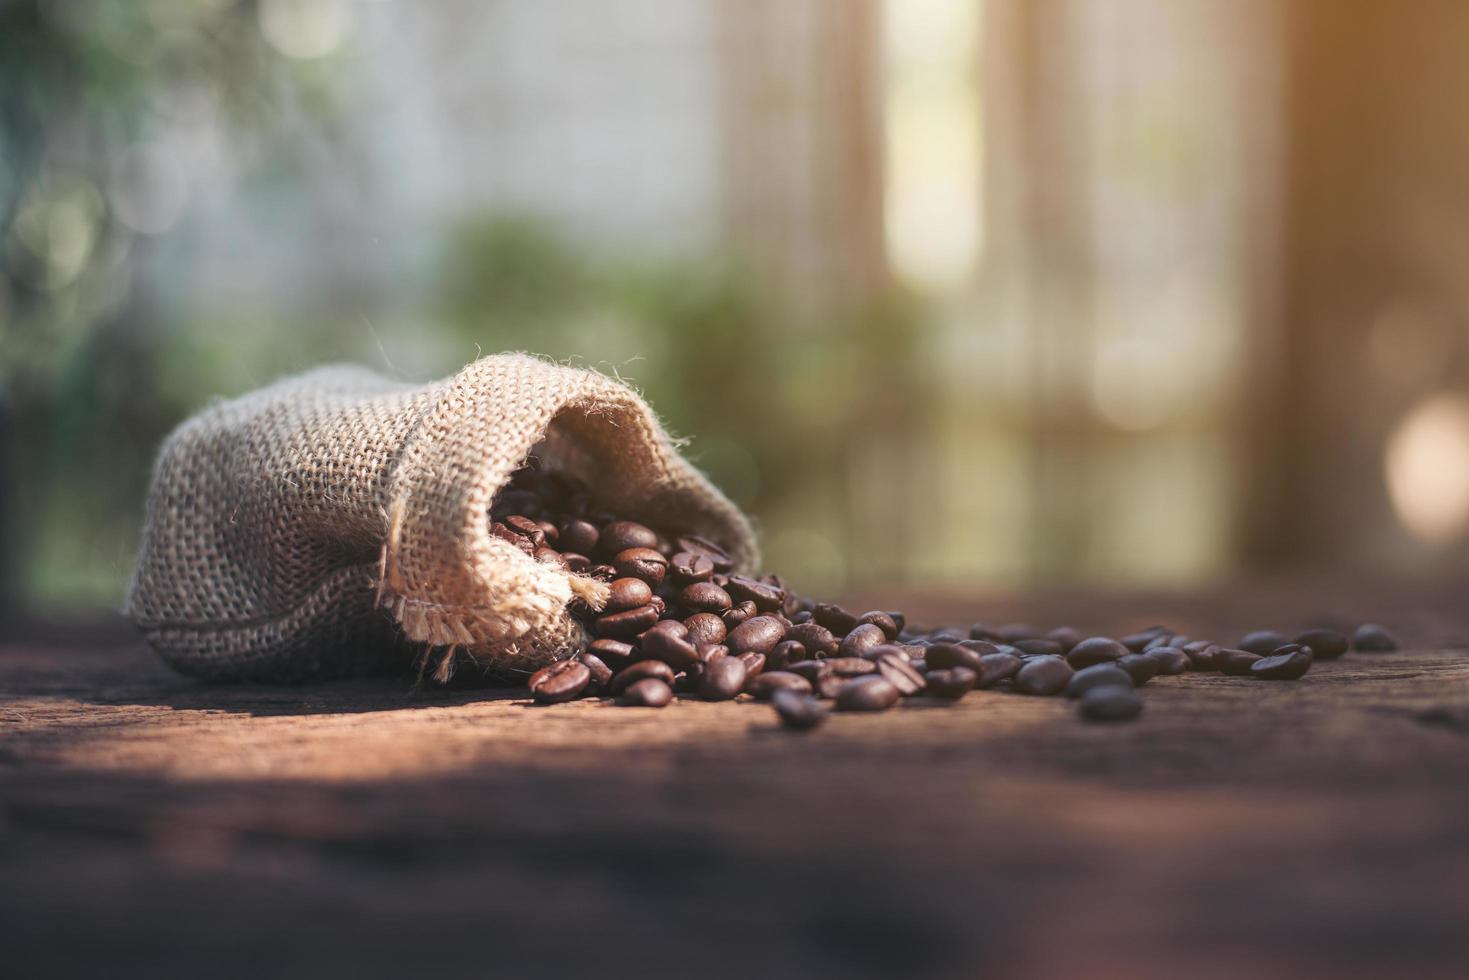 granos de café en una bolsa de arpillera foto